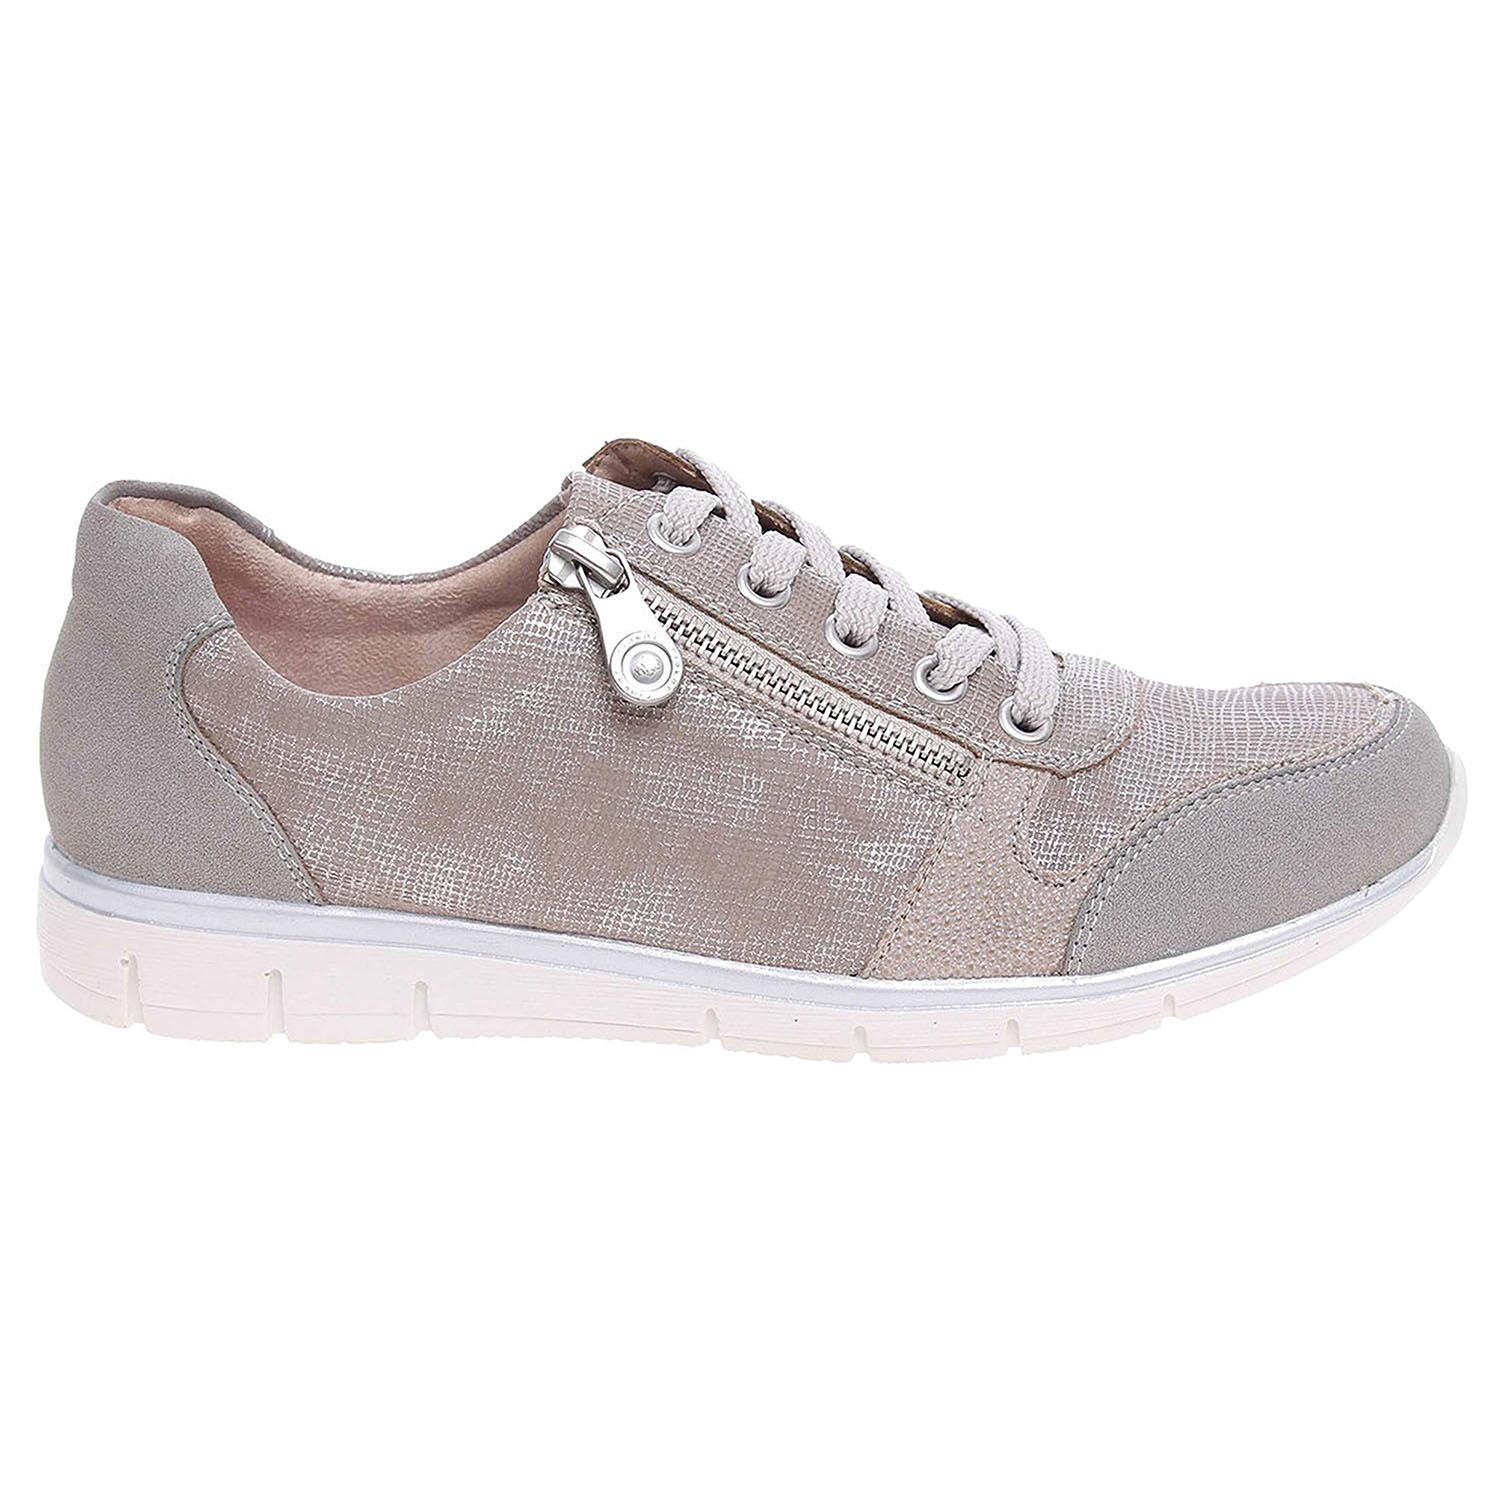 Ecco Rieker dámská obuv N4020-40 béžová-šedá 23200580 570ec7d4a77